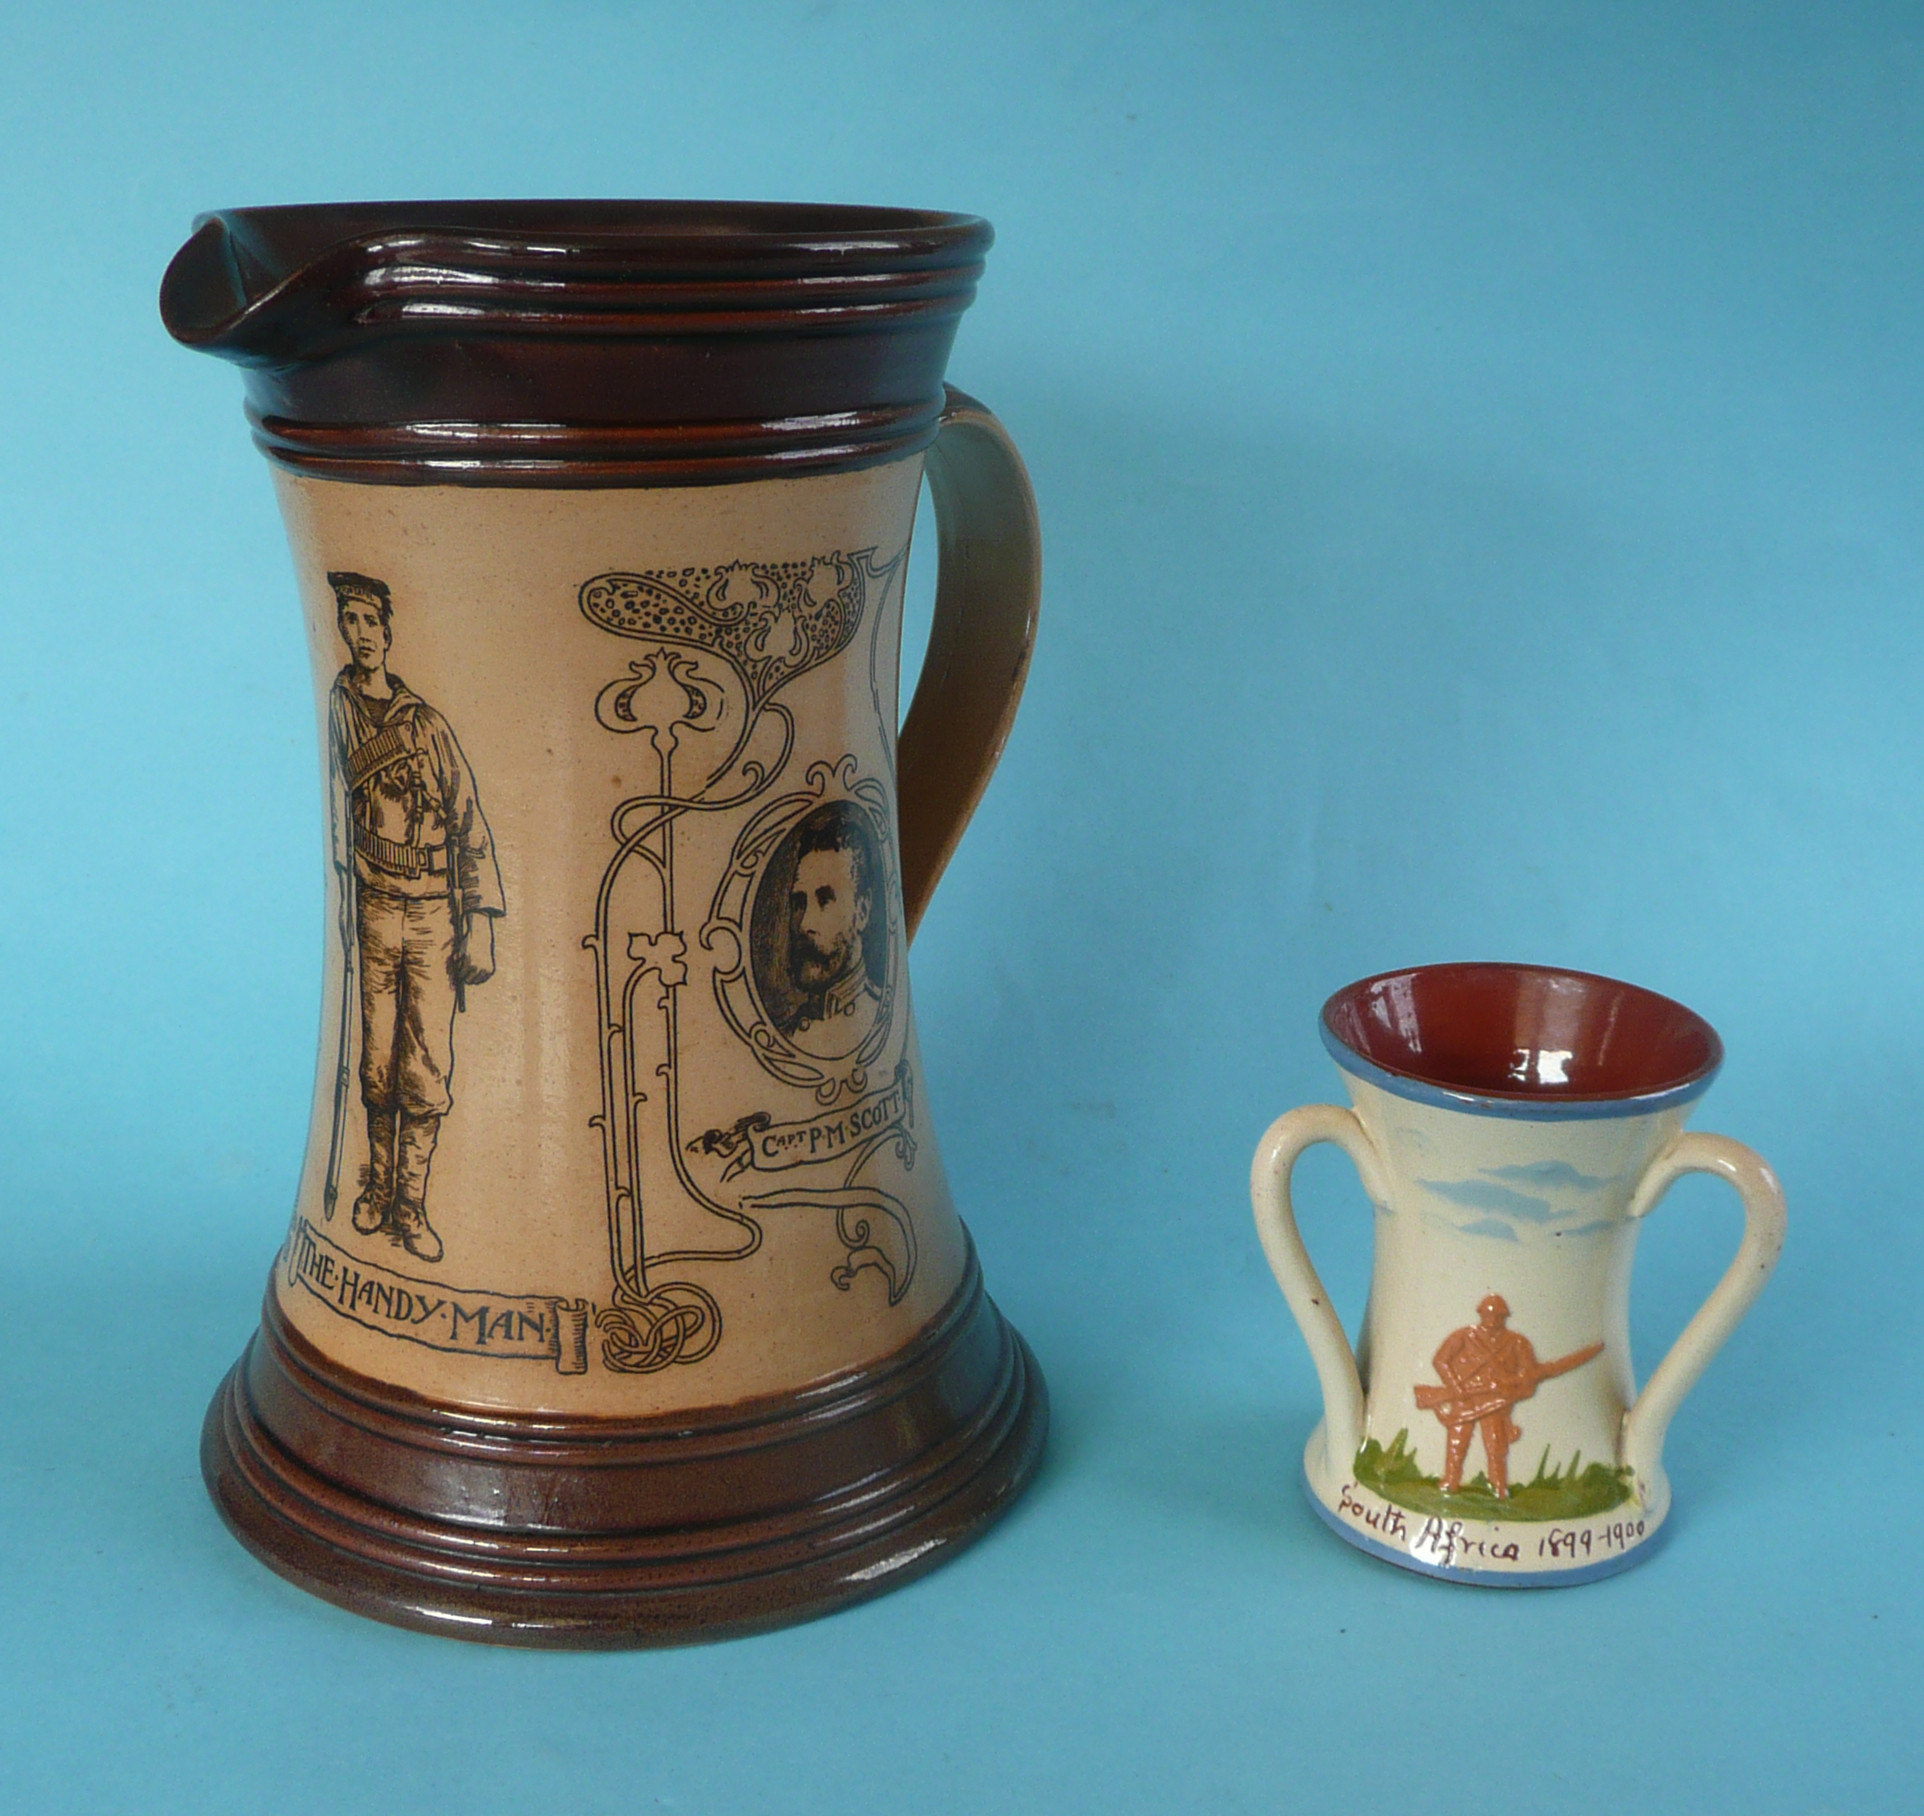 Lot 52 - Boer War: a Doulton Lambeth brown stoneware jug printed with named portraits of Lambton and Scott,